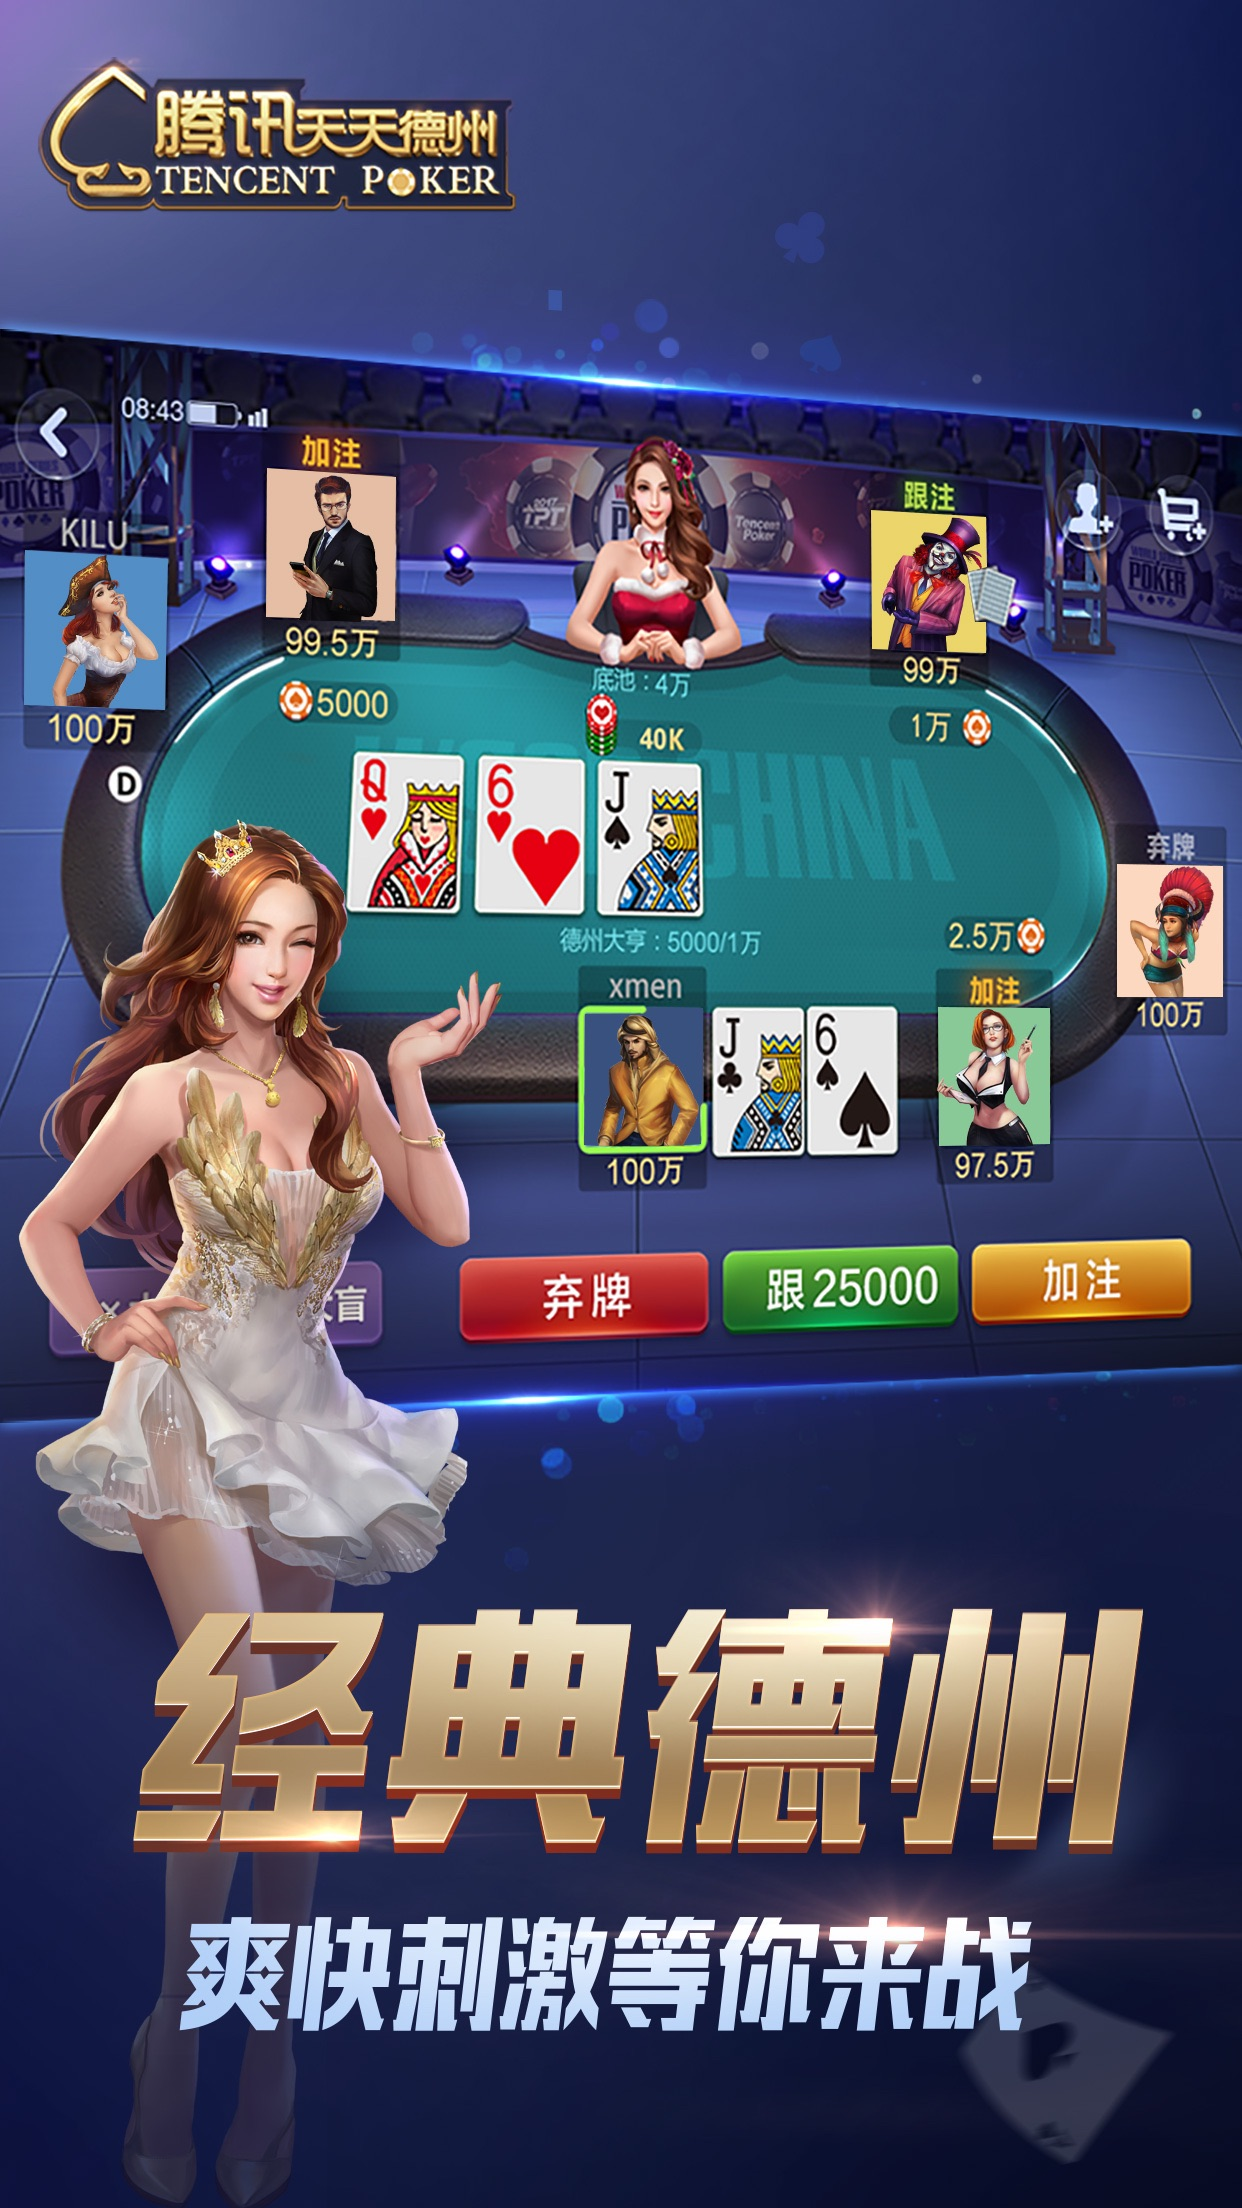 app description 《天天德州》是腾讯游戏精心打造的一款精品扑克